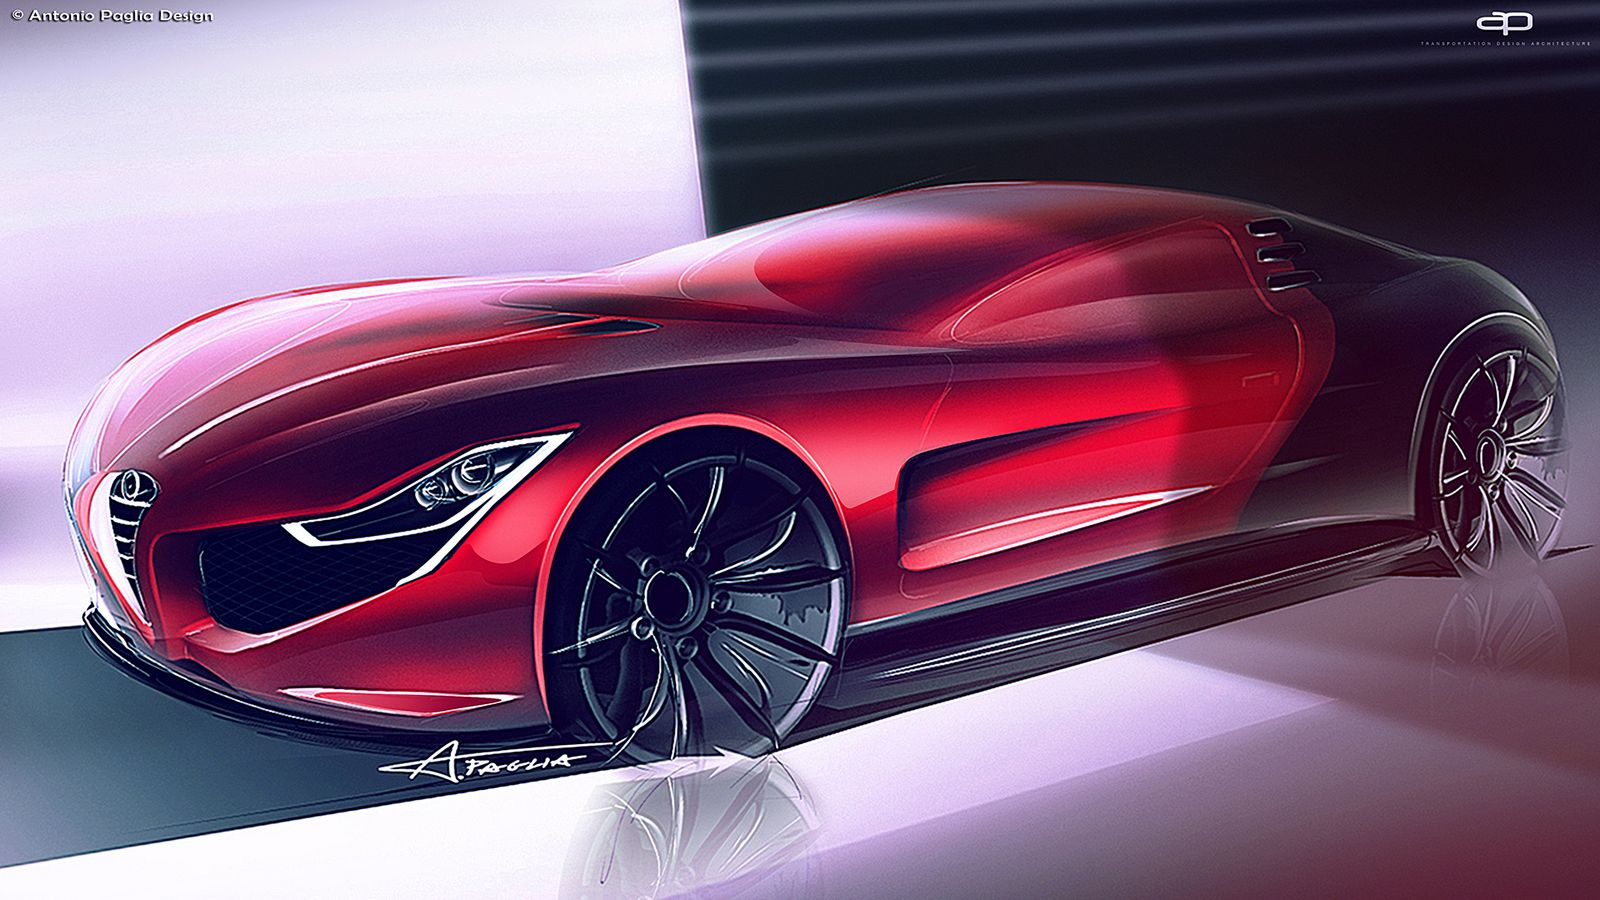 Alfa Romeo C18 Design Study Is A Futuristic 8C ...